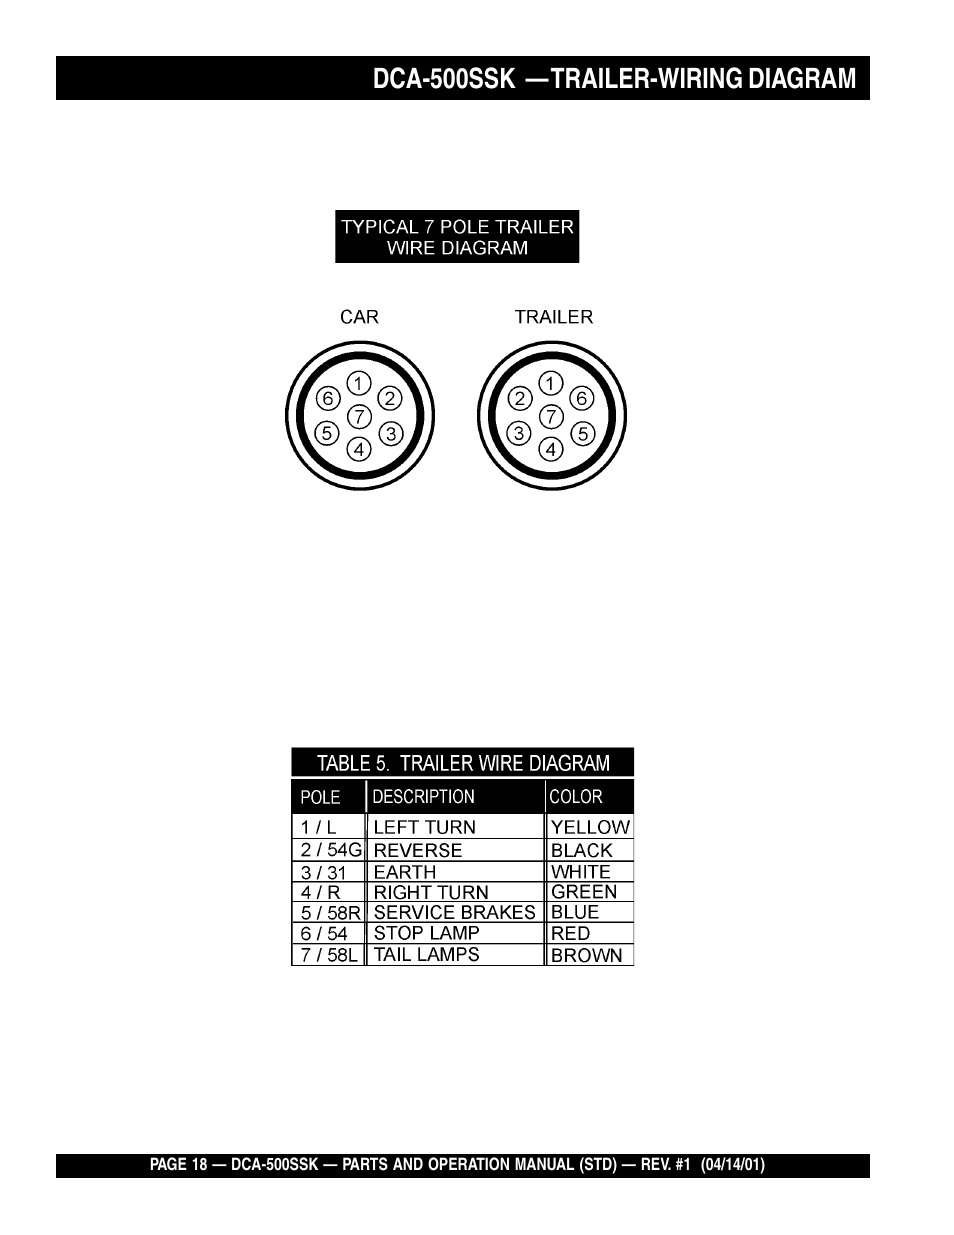 Multiquip 7 Way Trailer Wiring Diagram Good 1st 2001 F250 6 Round Dca 500ssk Dca500ssk User Rh Manualsdir Com Plug